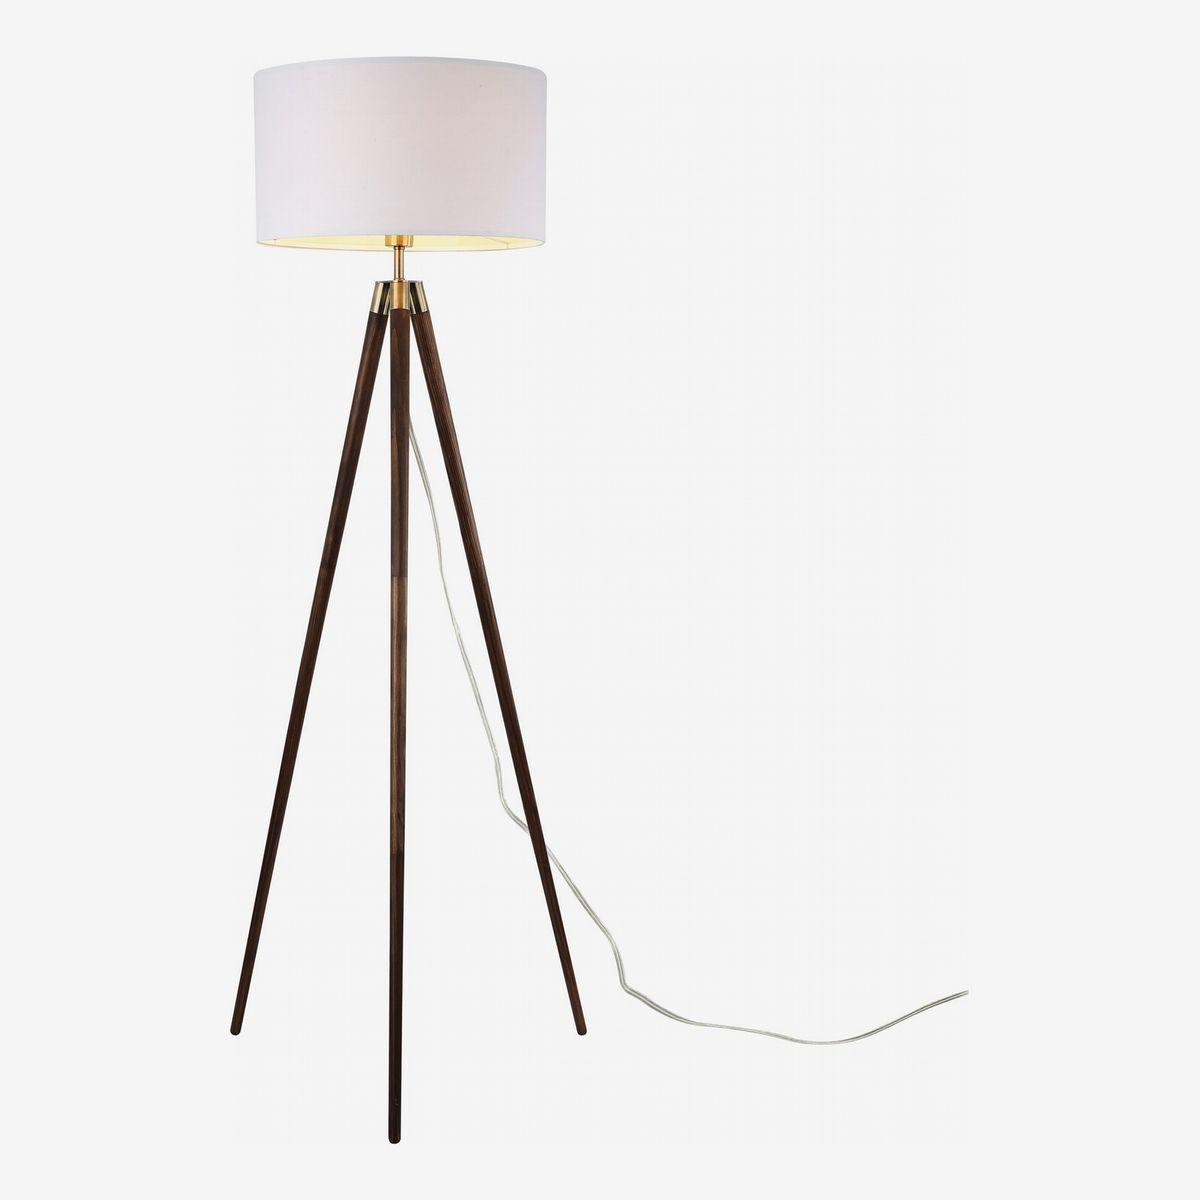 11 Best Floor Lamps 11  The Strategist  New York Magazine